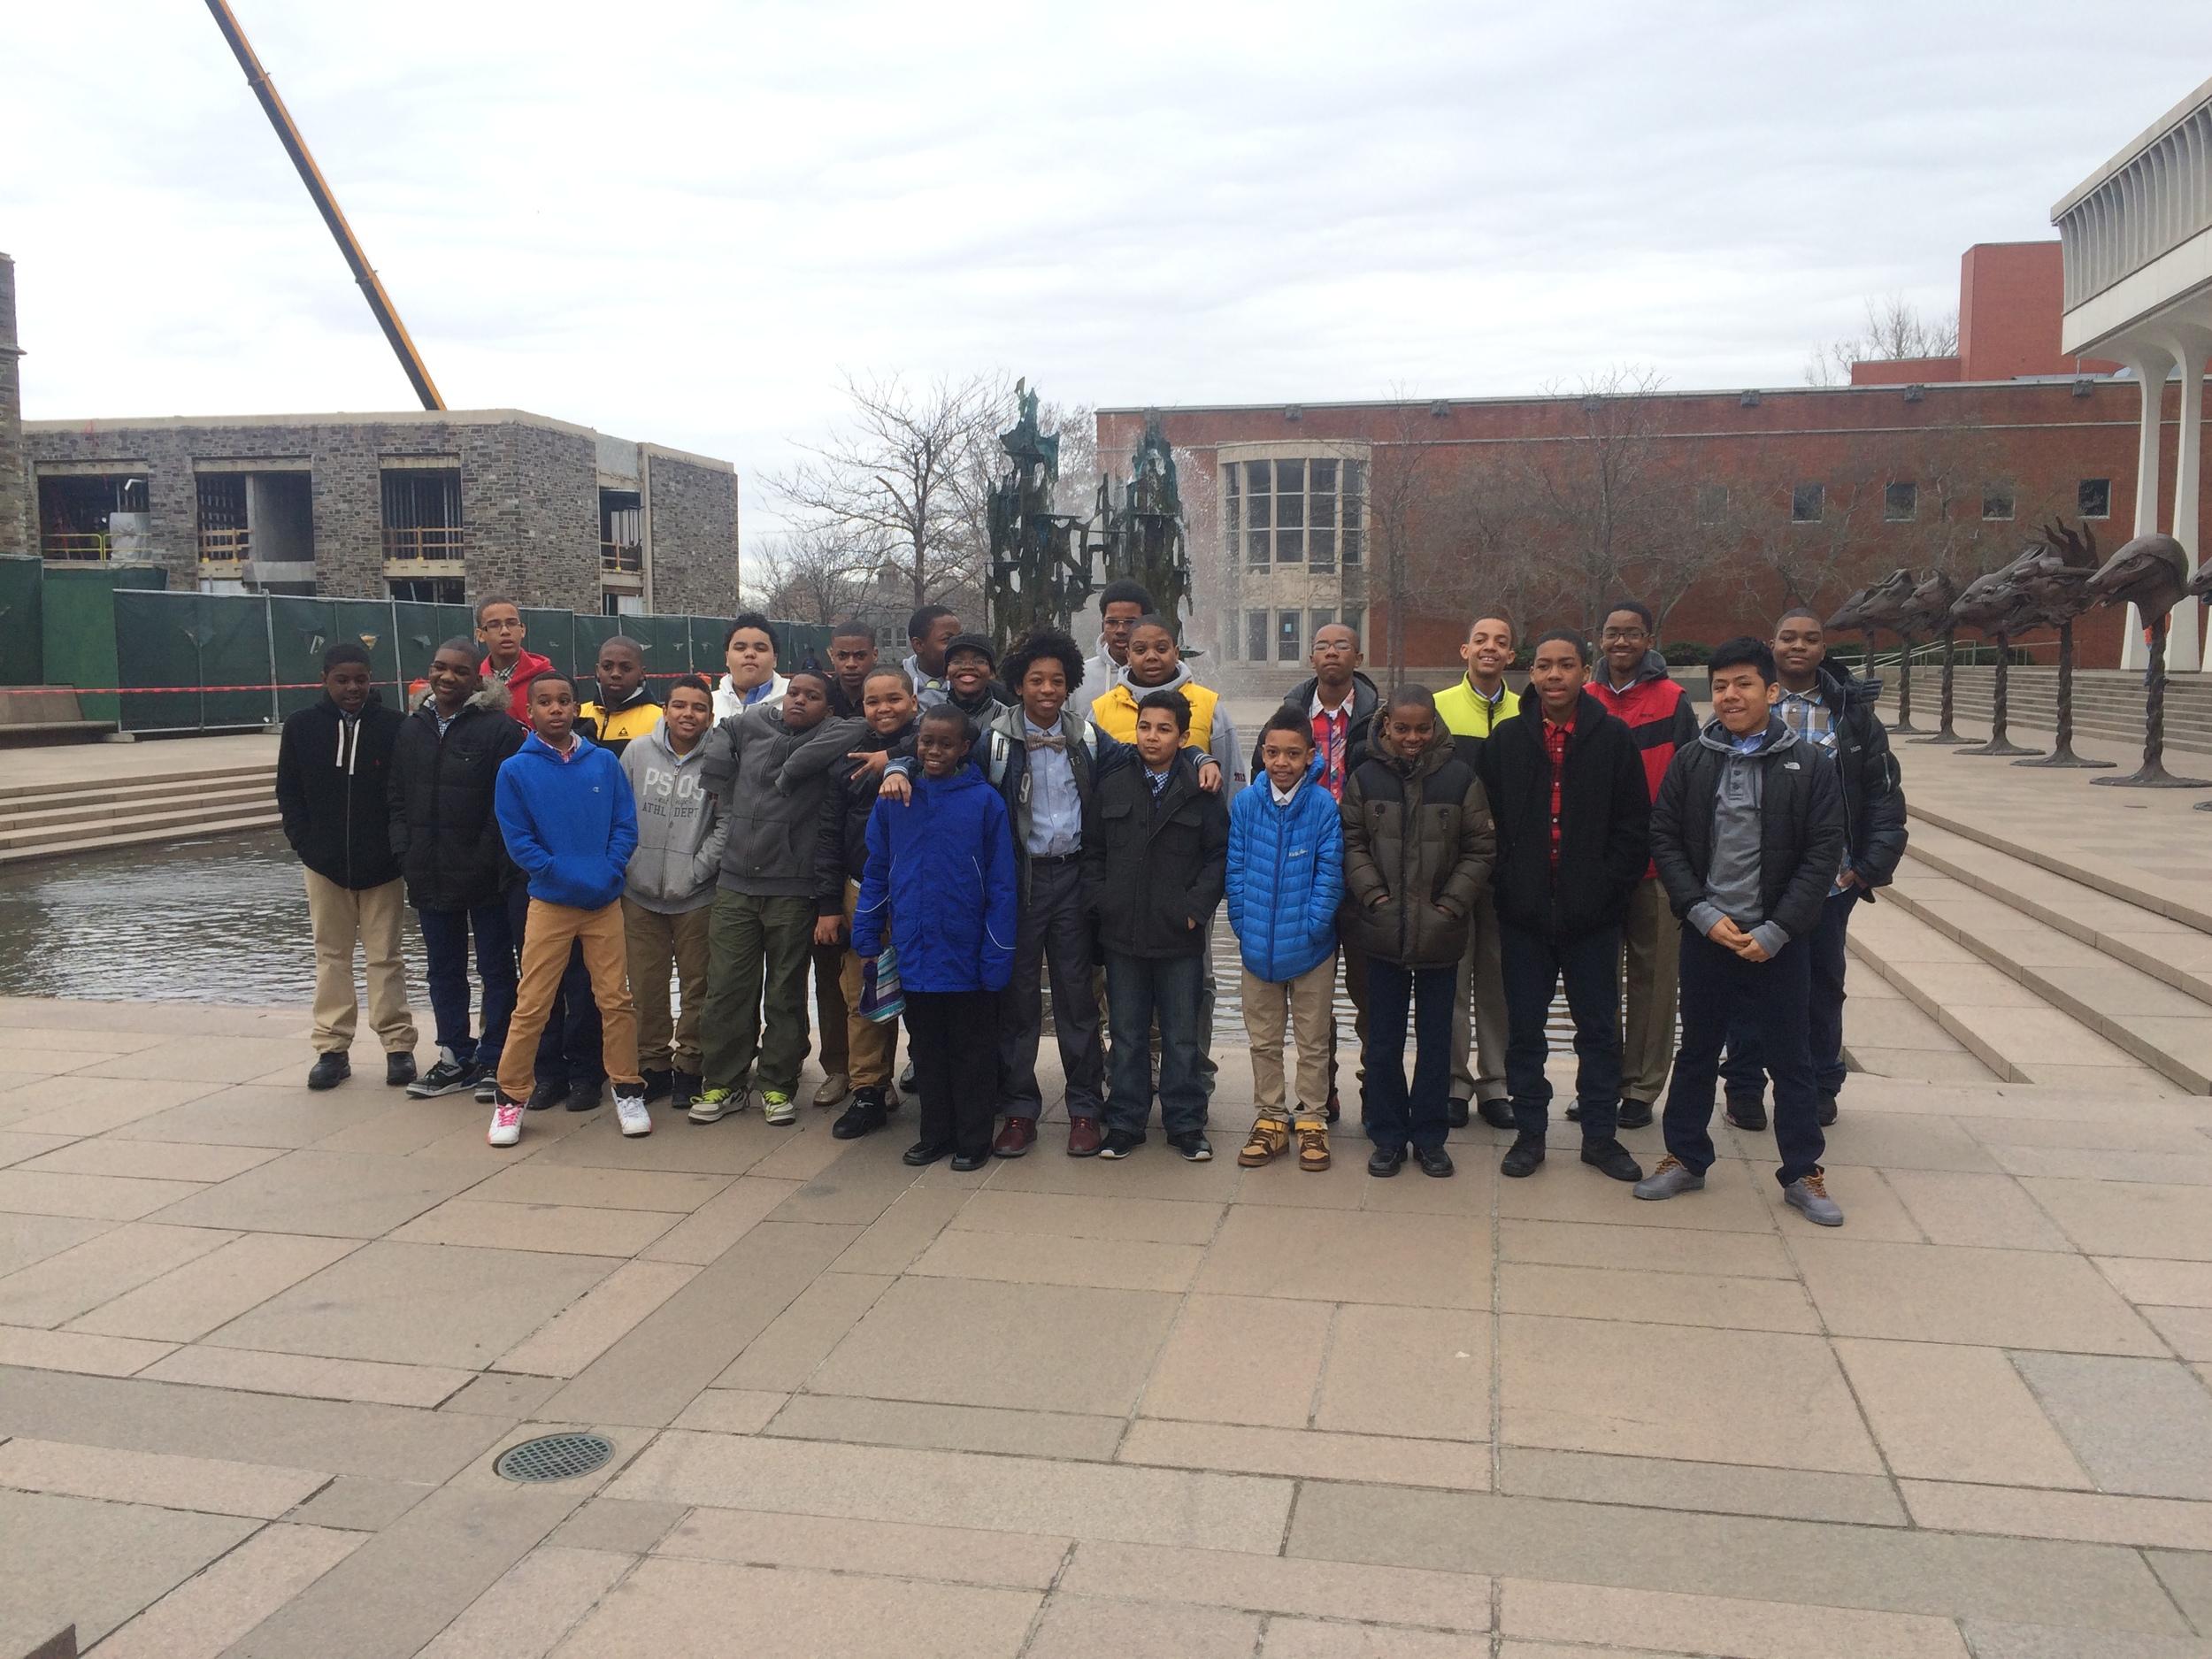 FDA Boys in Princeton 2015 Photo #1.jpg